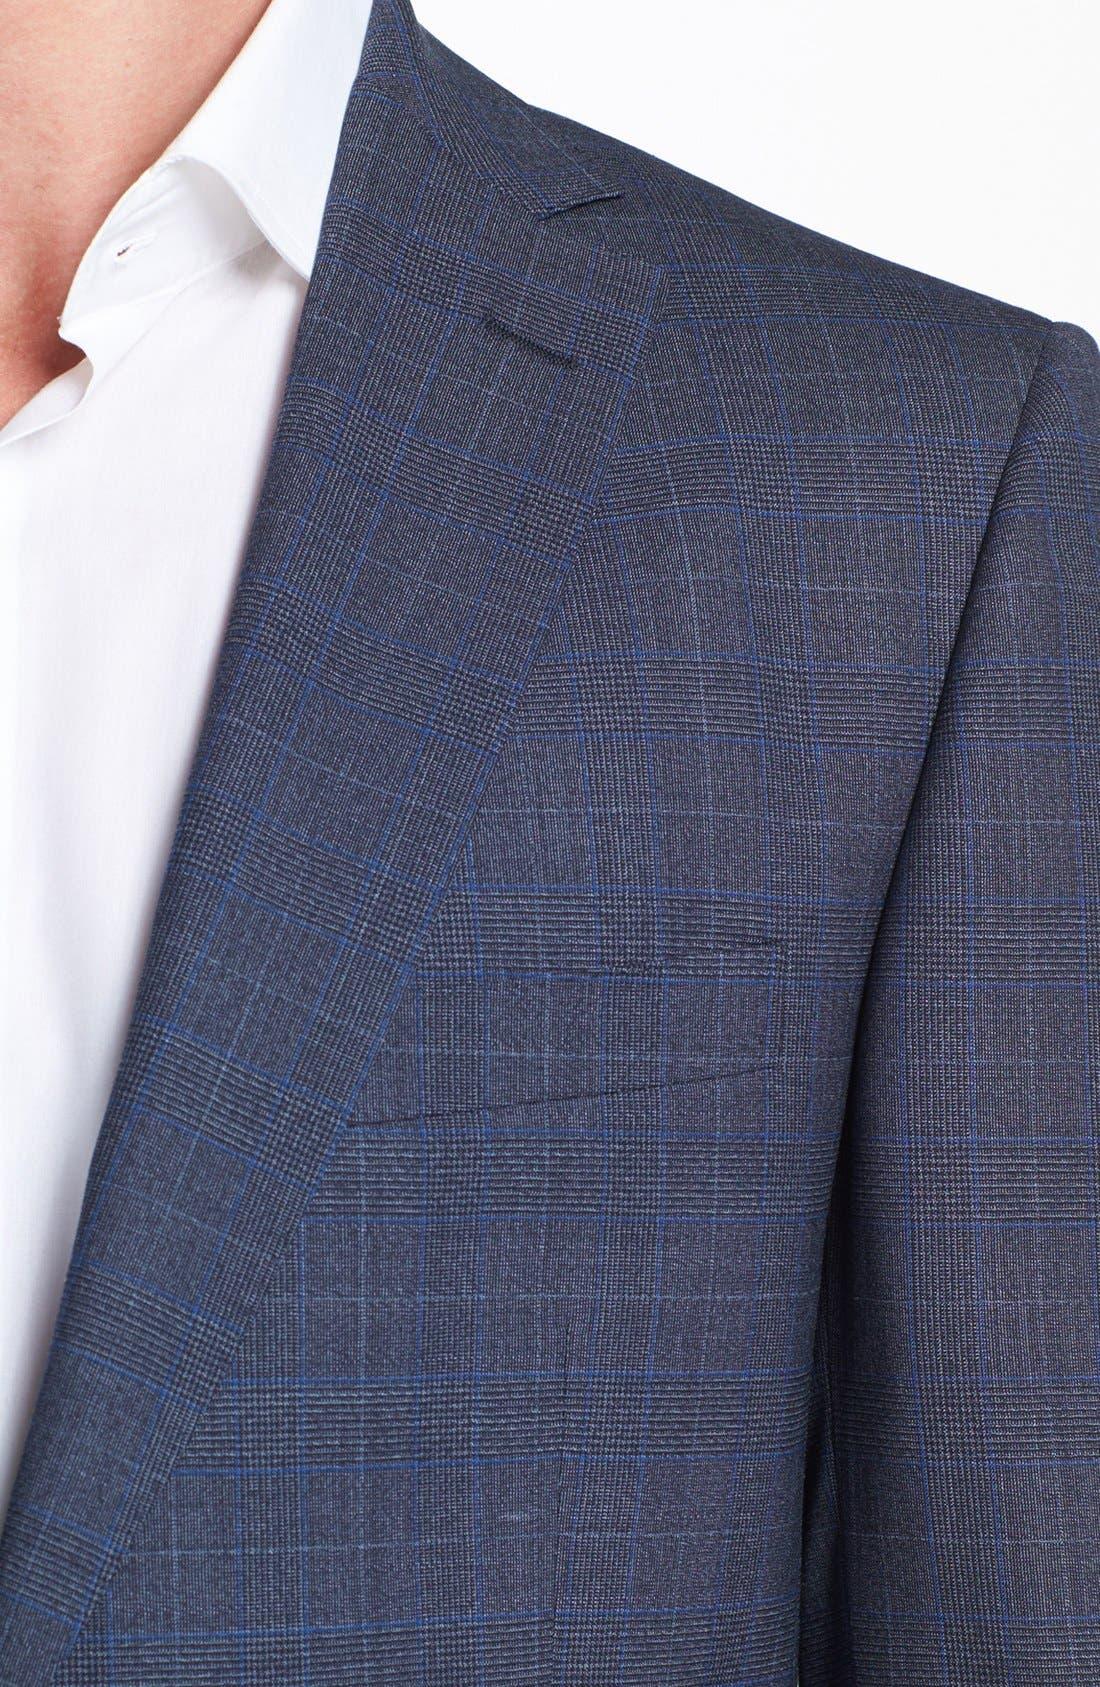 Alternate Image 2  - Z Zegna Plaid Wool Suit